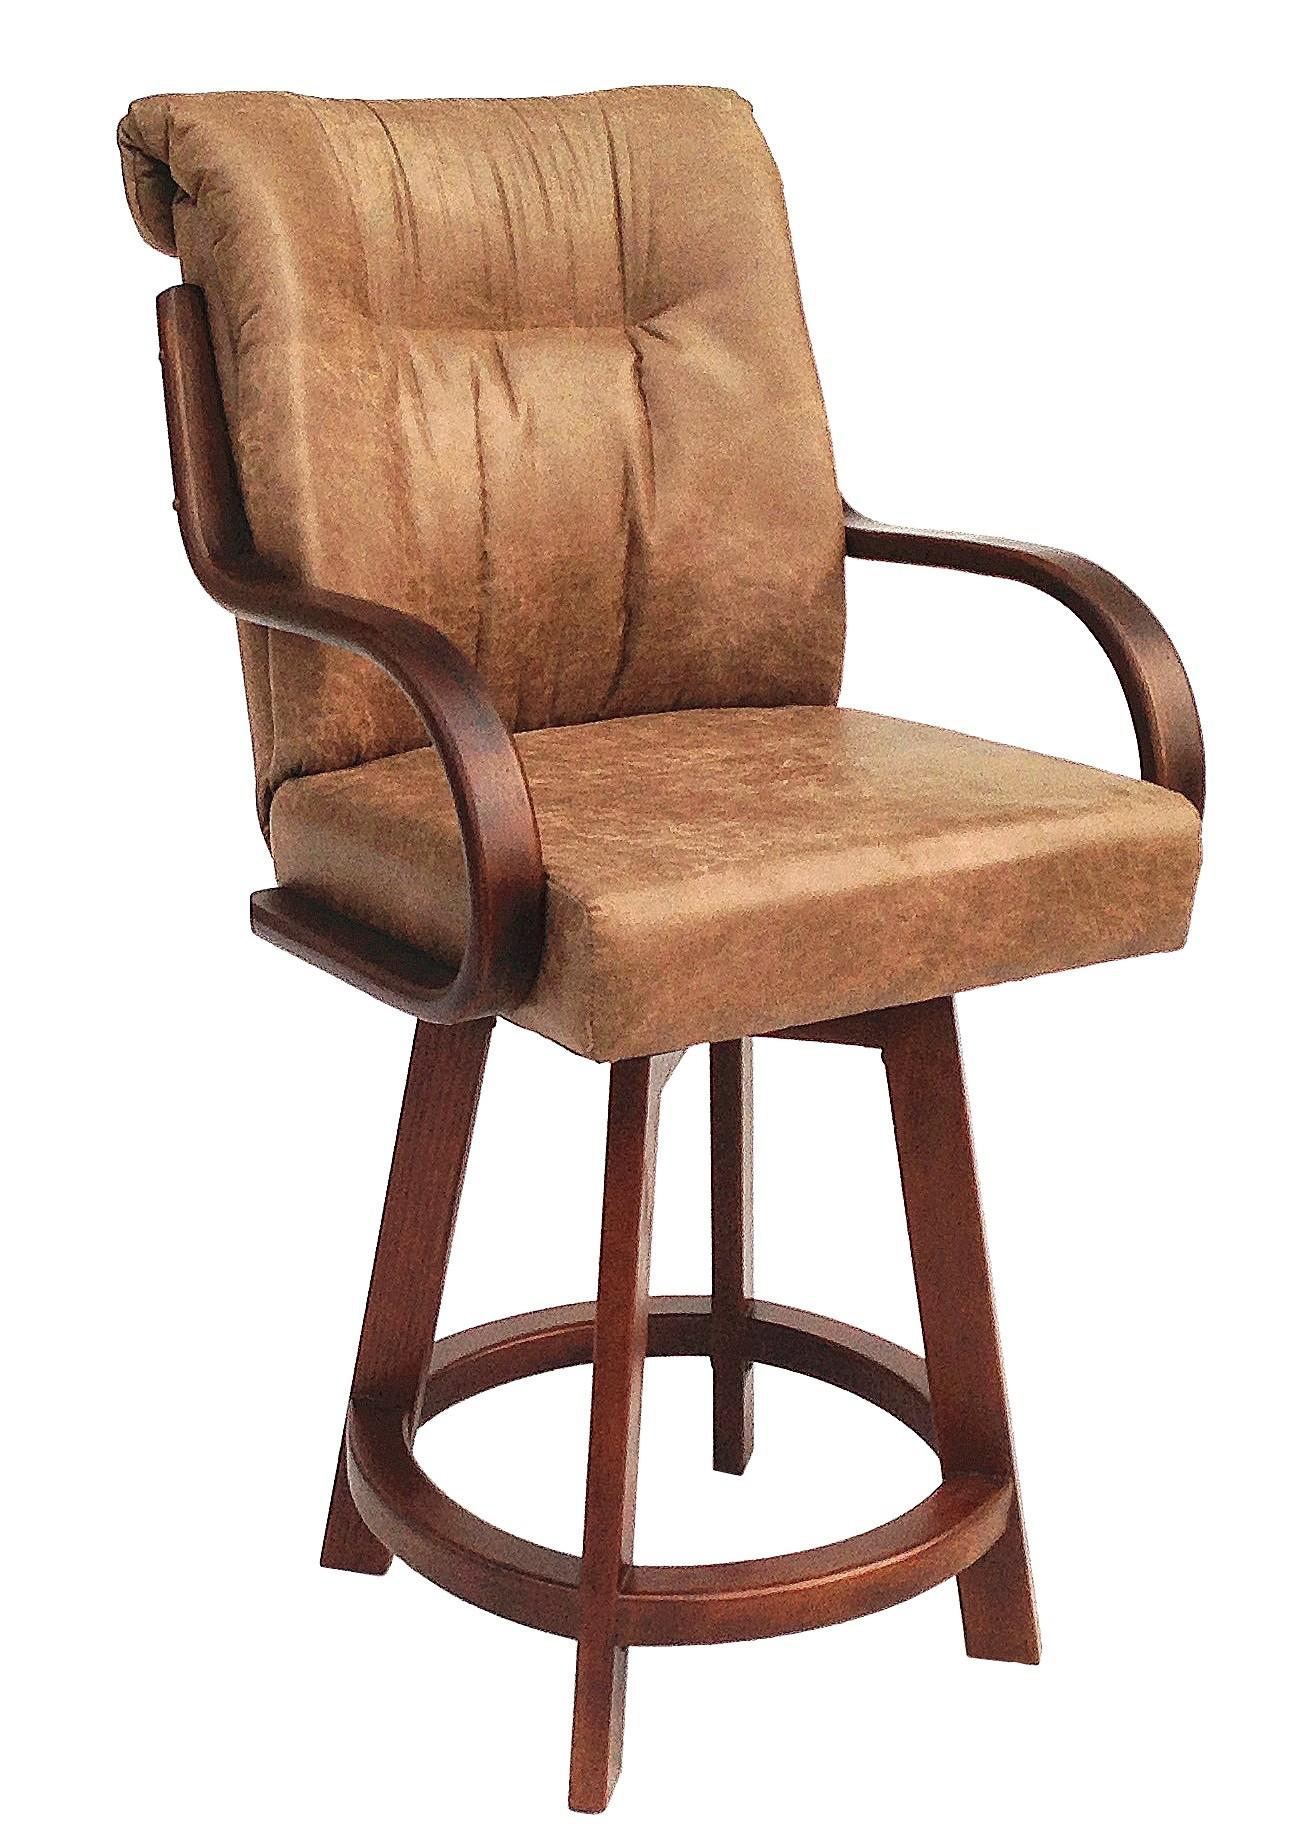 Chromcraft Furniture C179 384 Swivel 26 Quot Wood Bar Stool